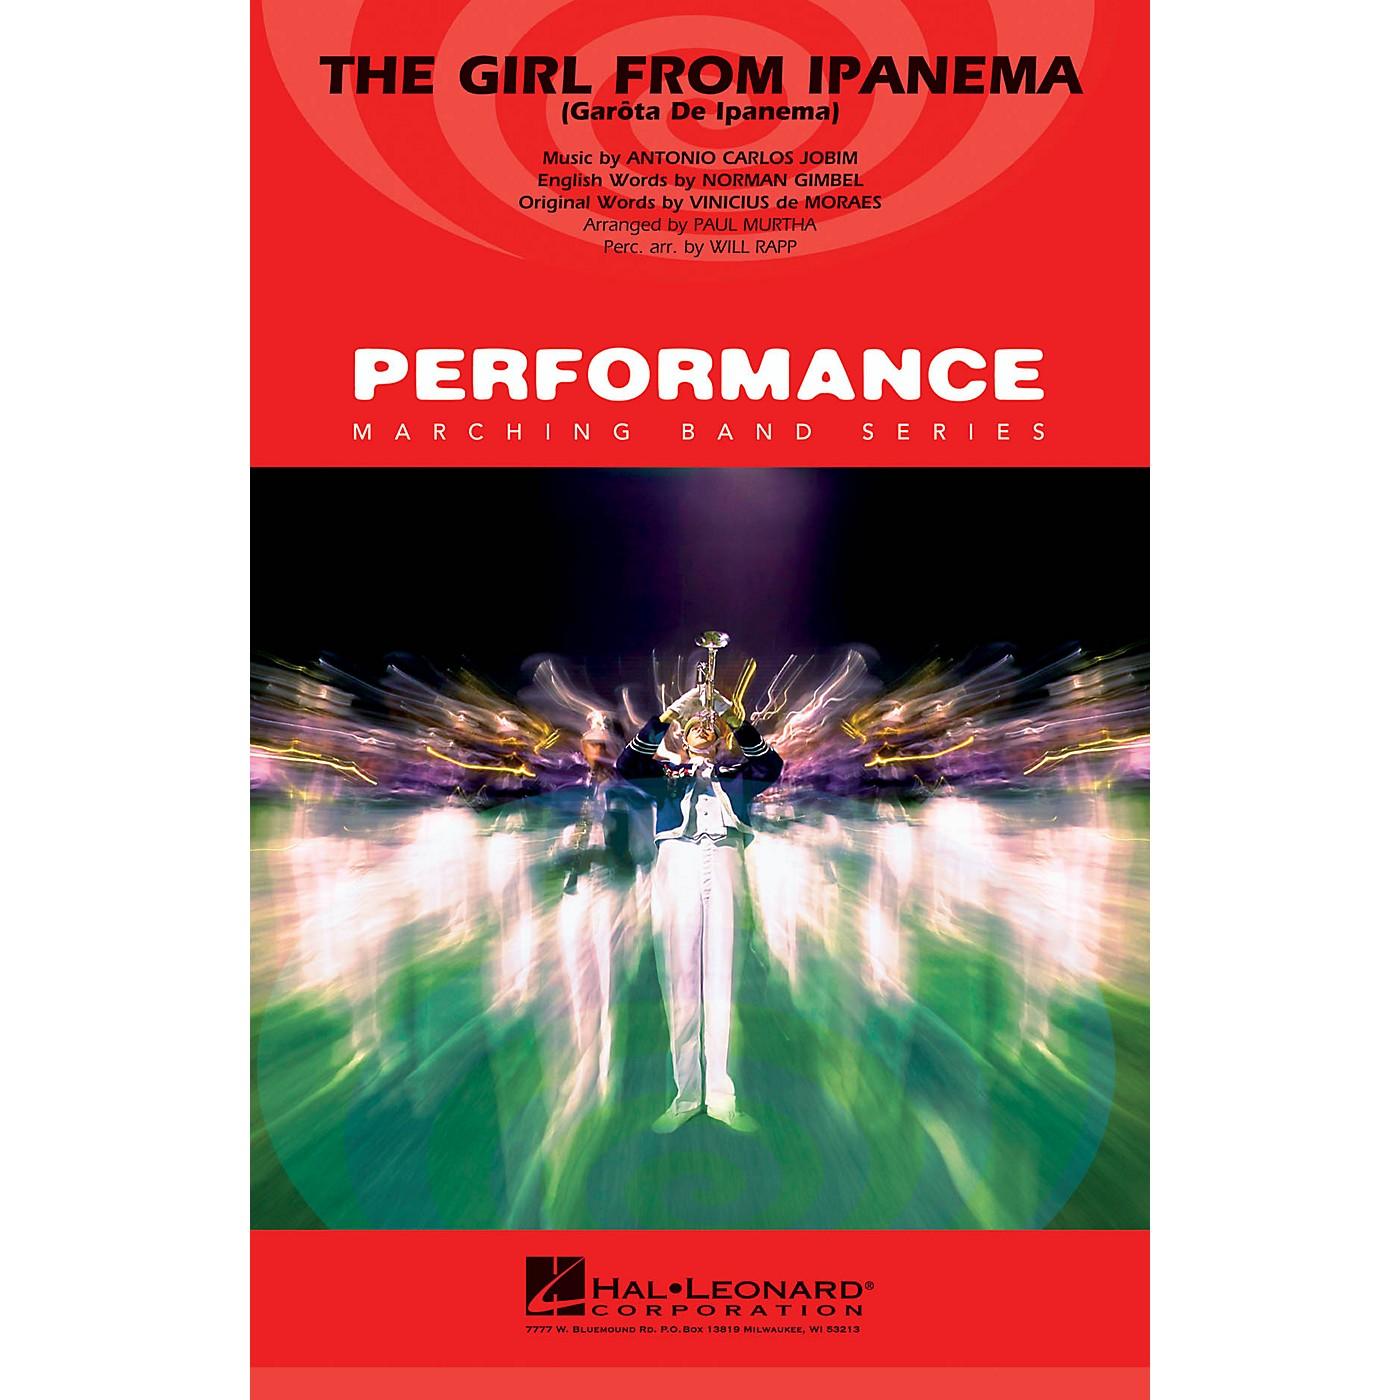 Hal Leonard The Girl from Ipanema (Garôta de Ipanema) Marching Band Level 3-4 Arranged by Paul Murtha thumbnail